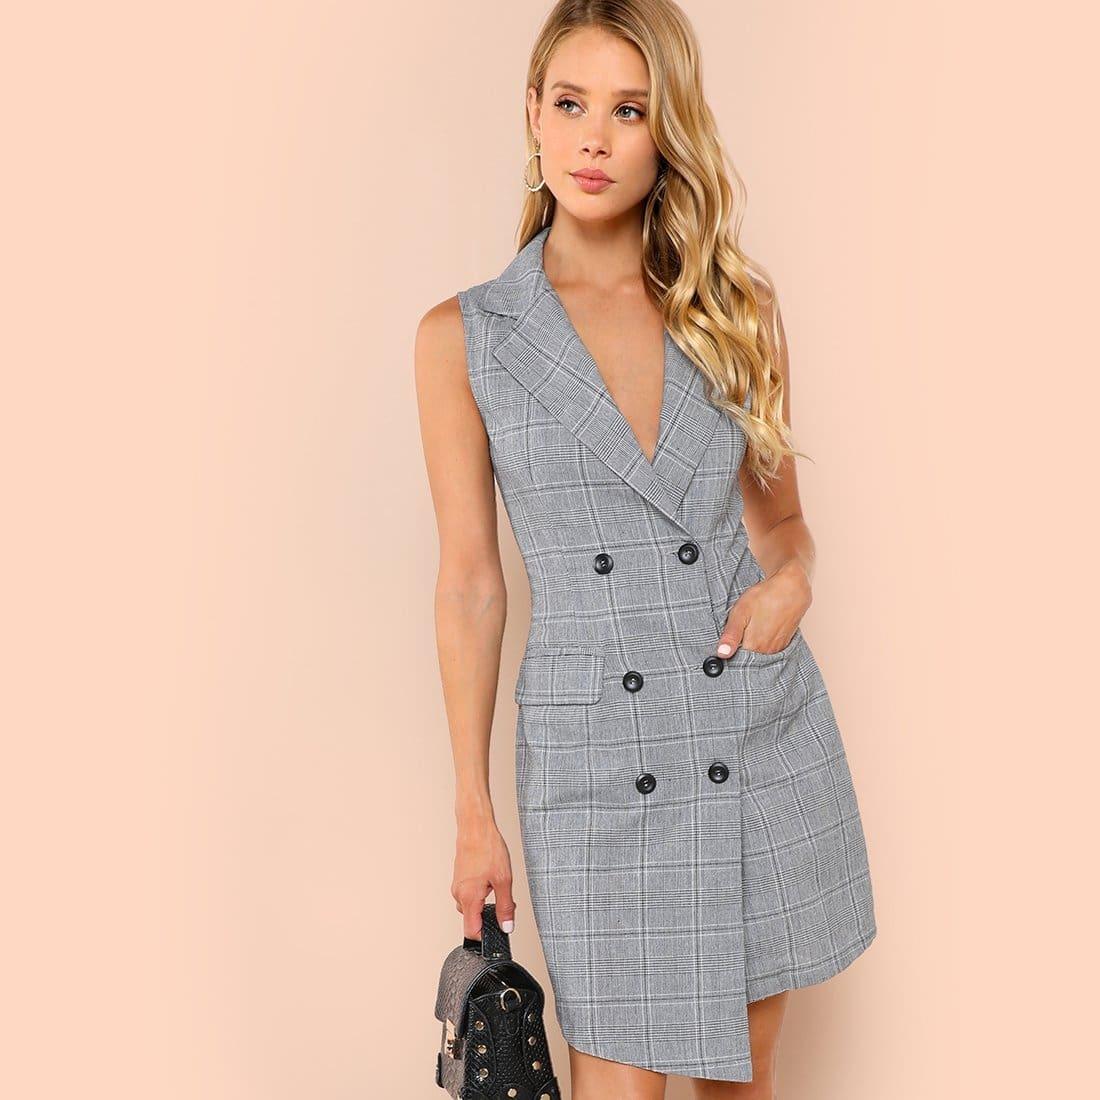 Geruite jurk met dubble rij knopen